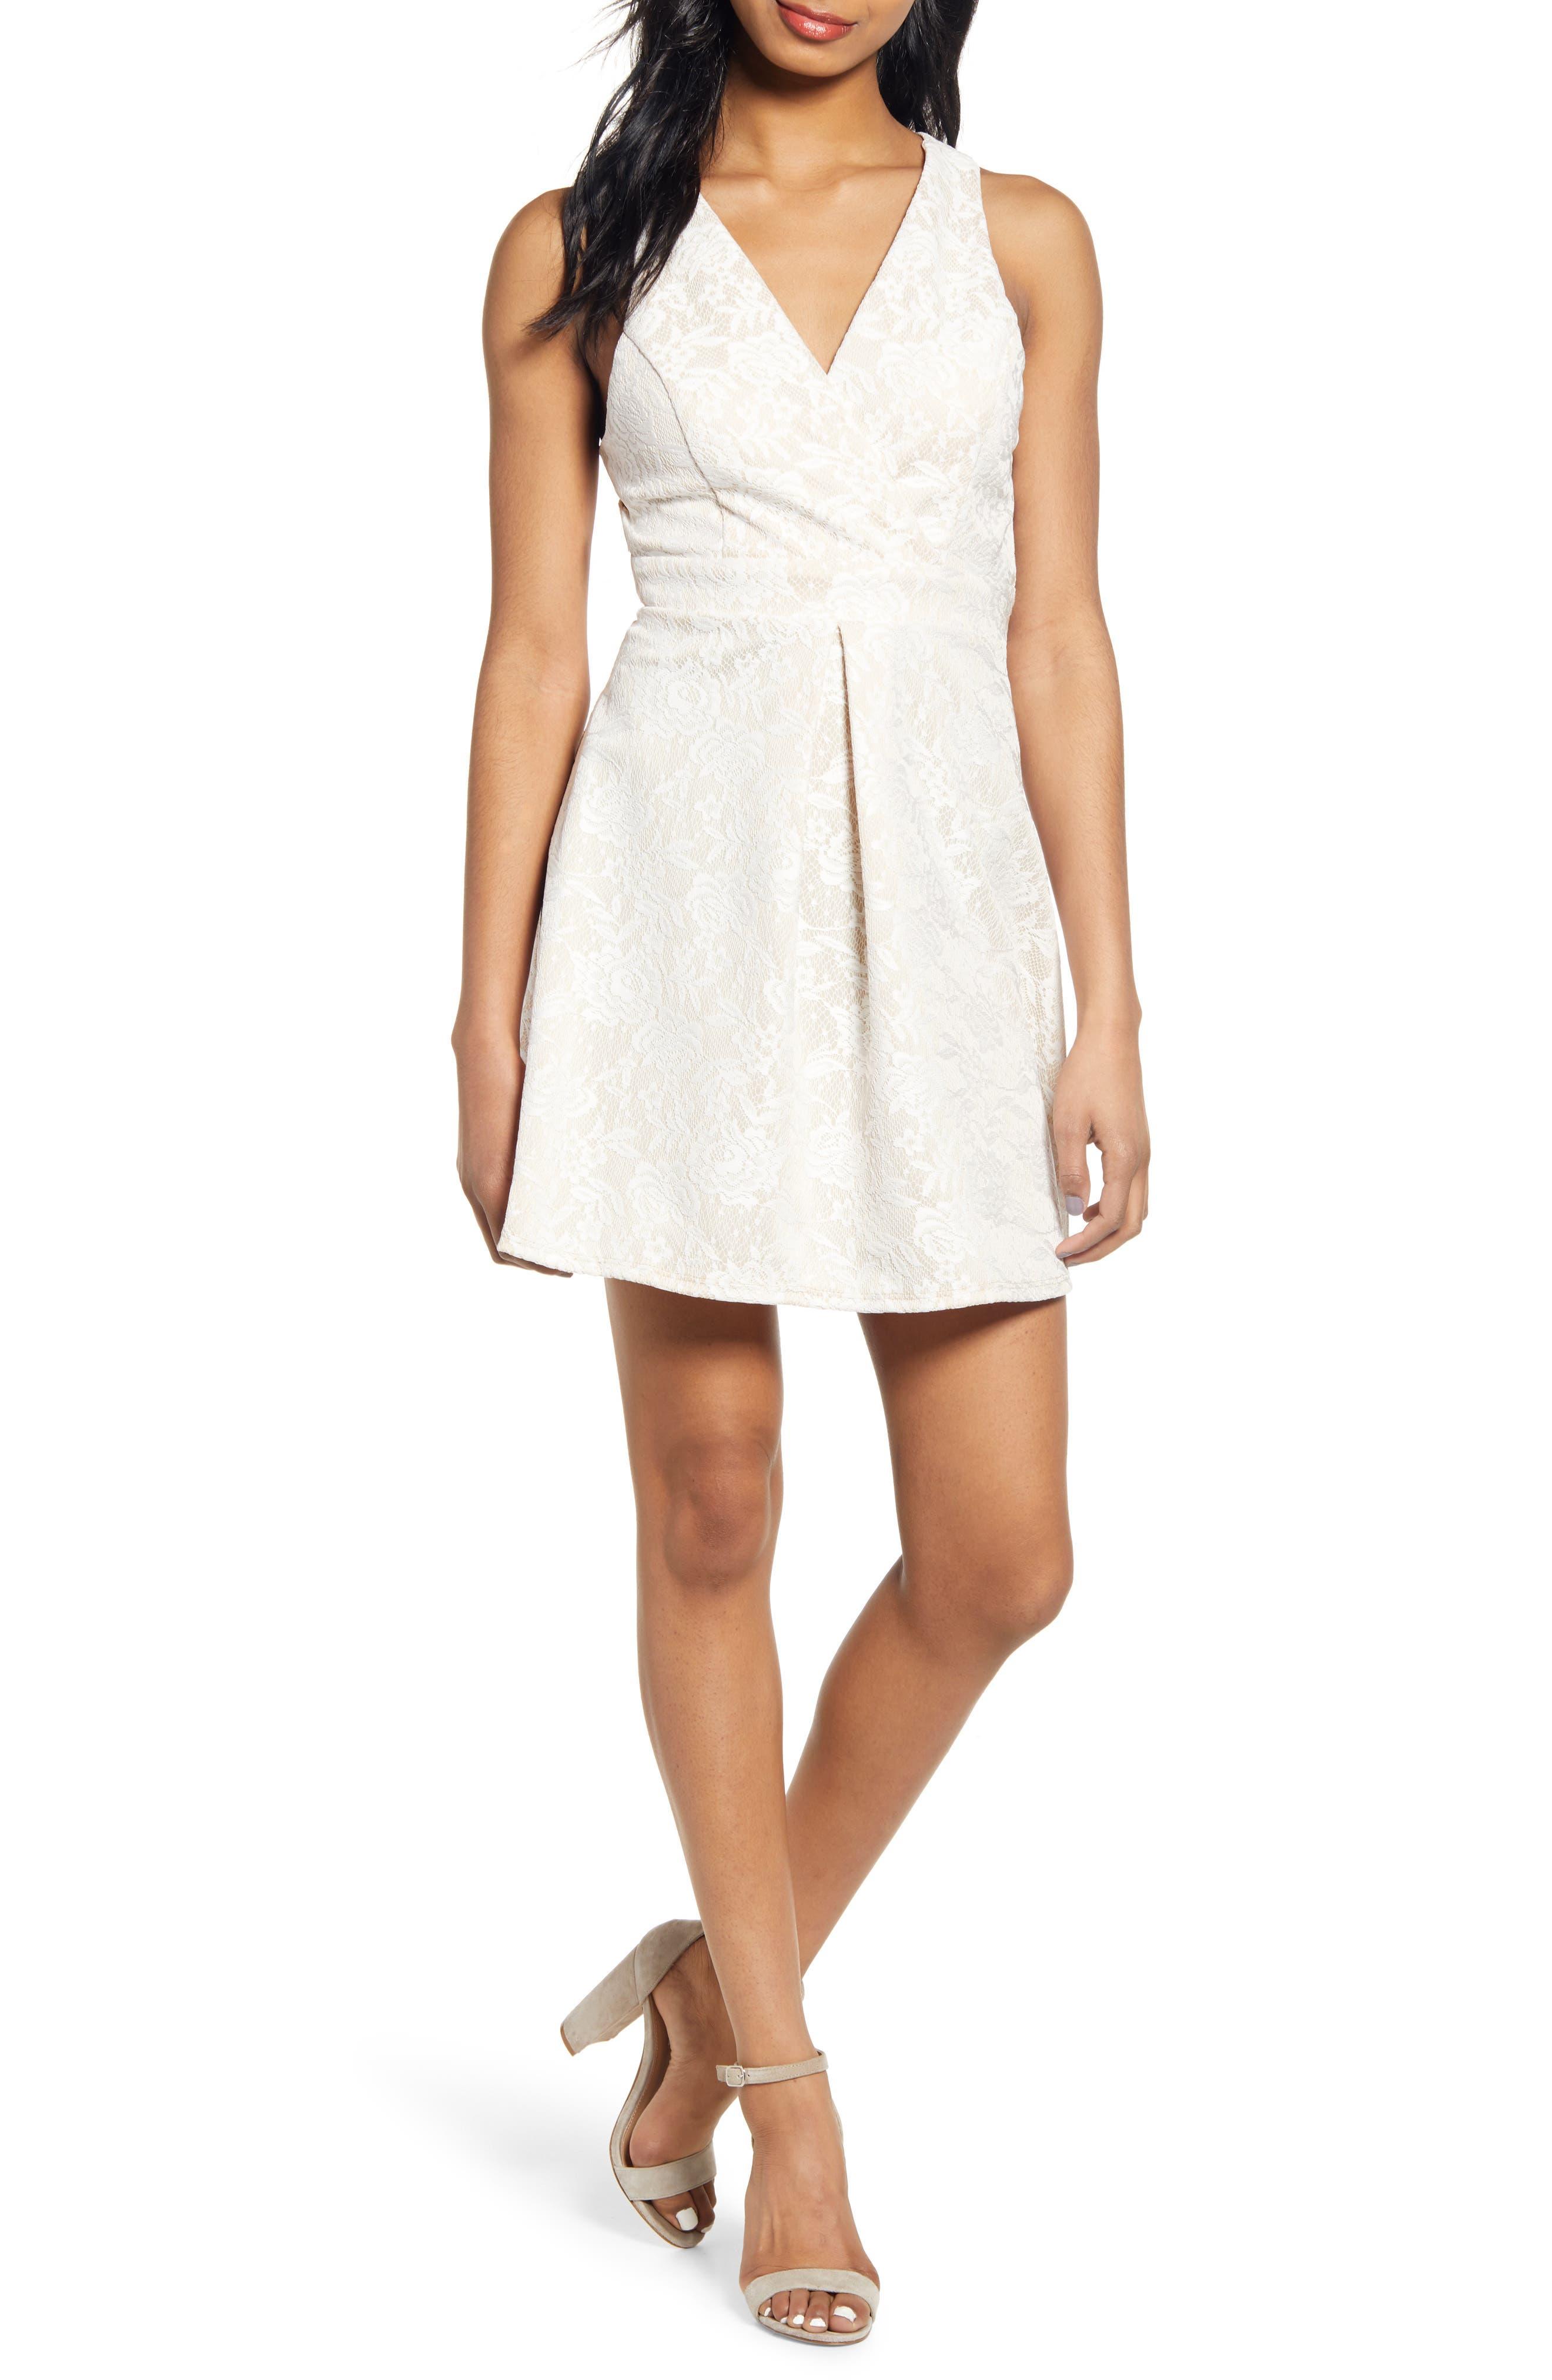 Speechless Strappy Open Back Sleeveless Jacquard Fit & Flare Dress, Ivory